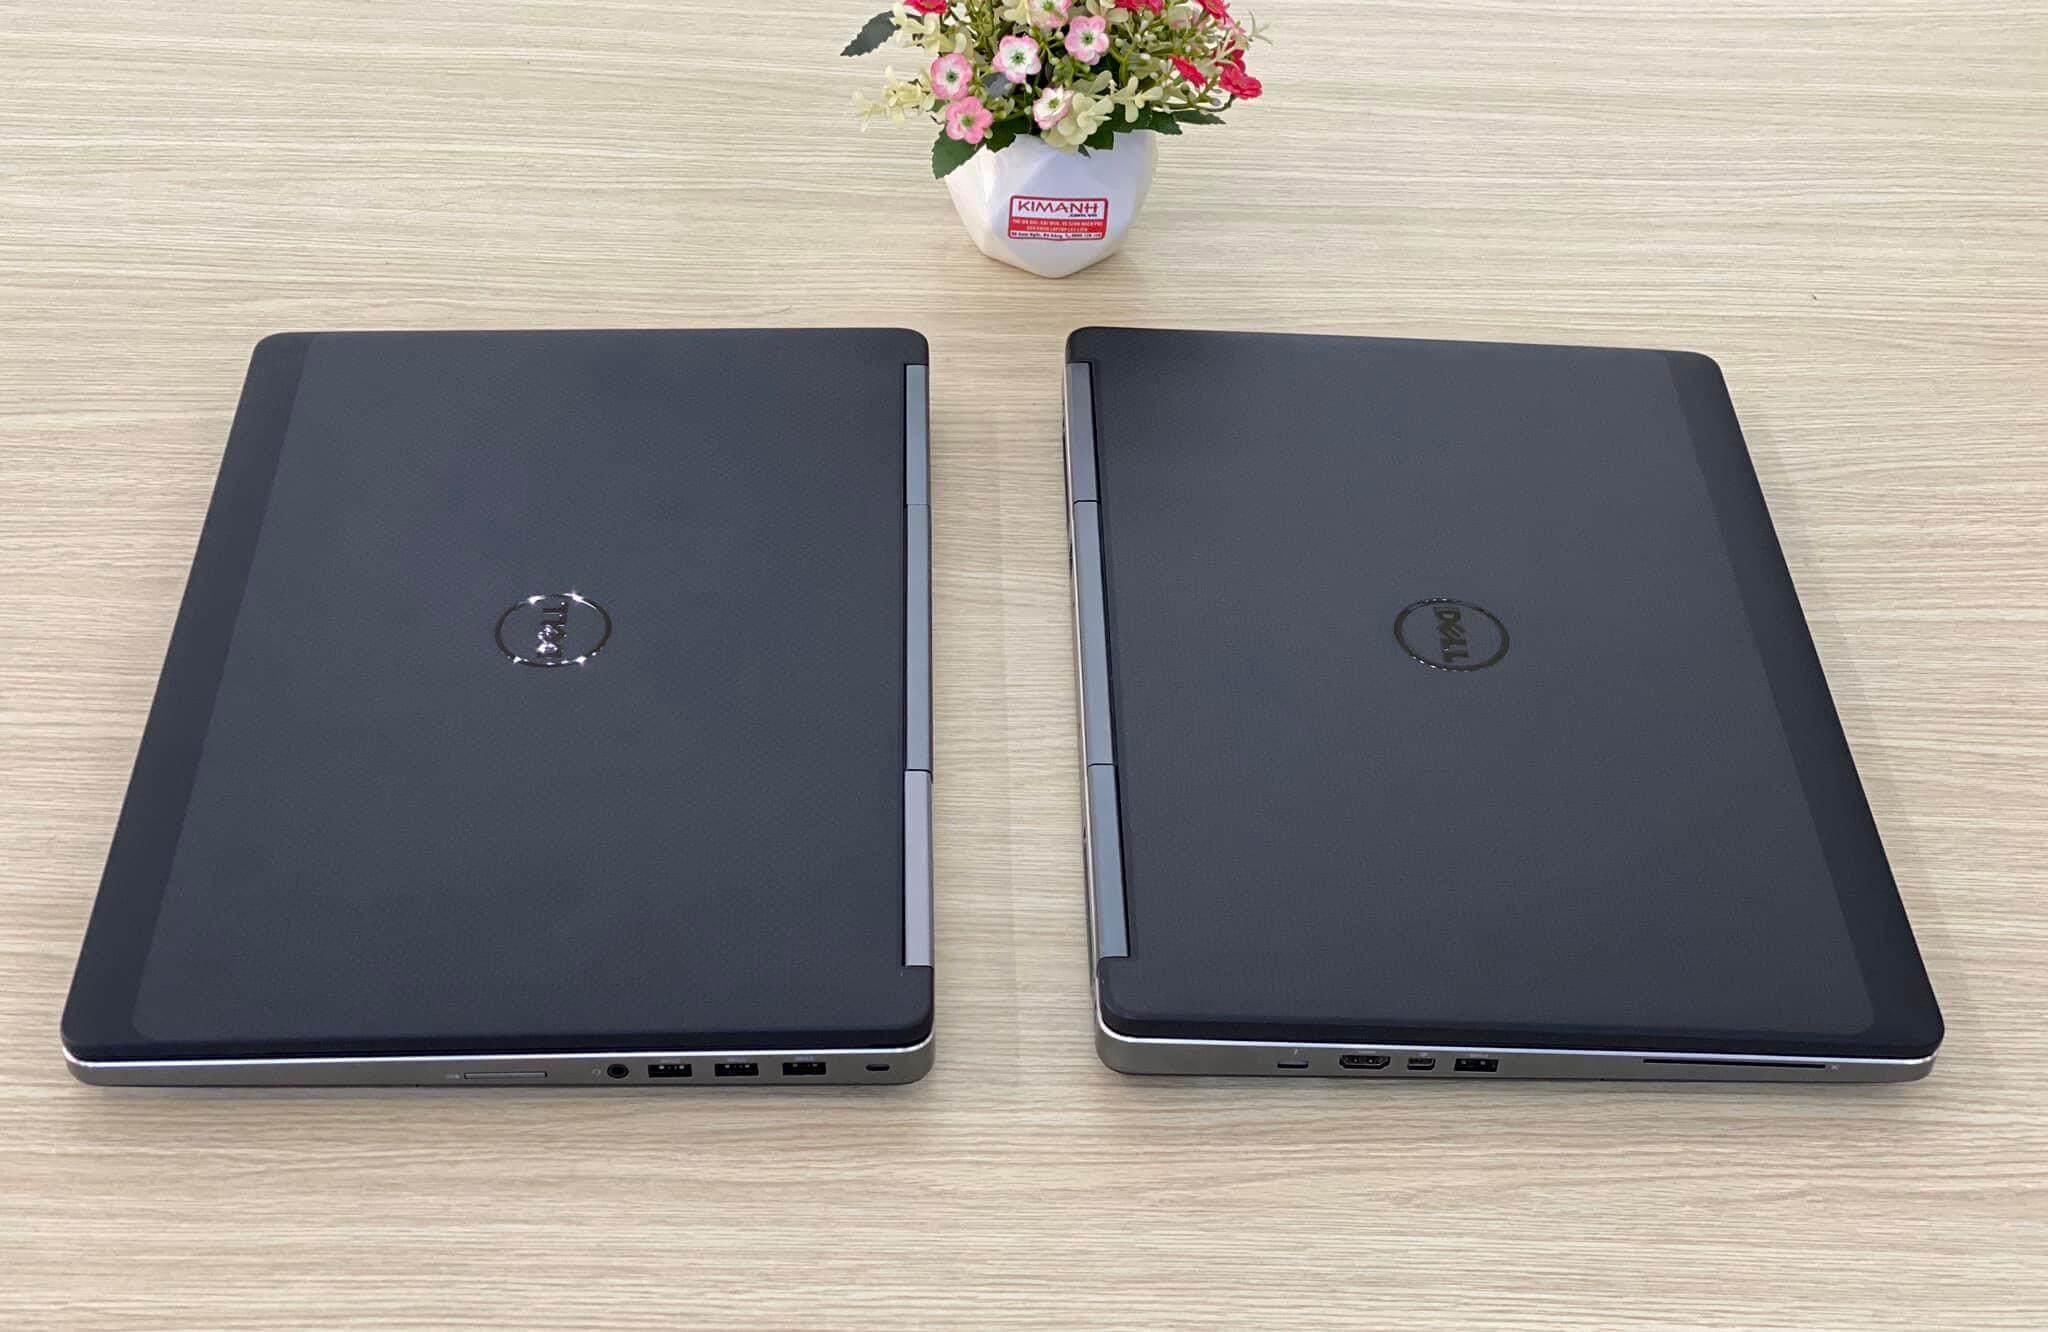 [99%] Dell Precision 7510 i7-6820HQ RAM 8GB SSD 240GB VGA M1000M FHD